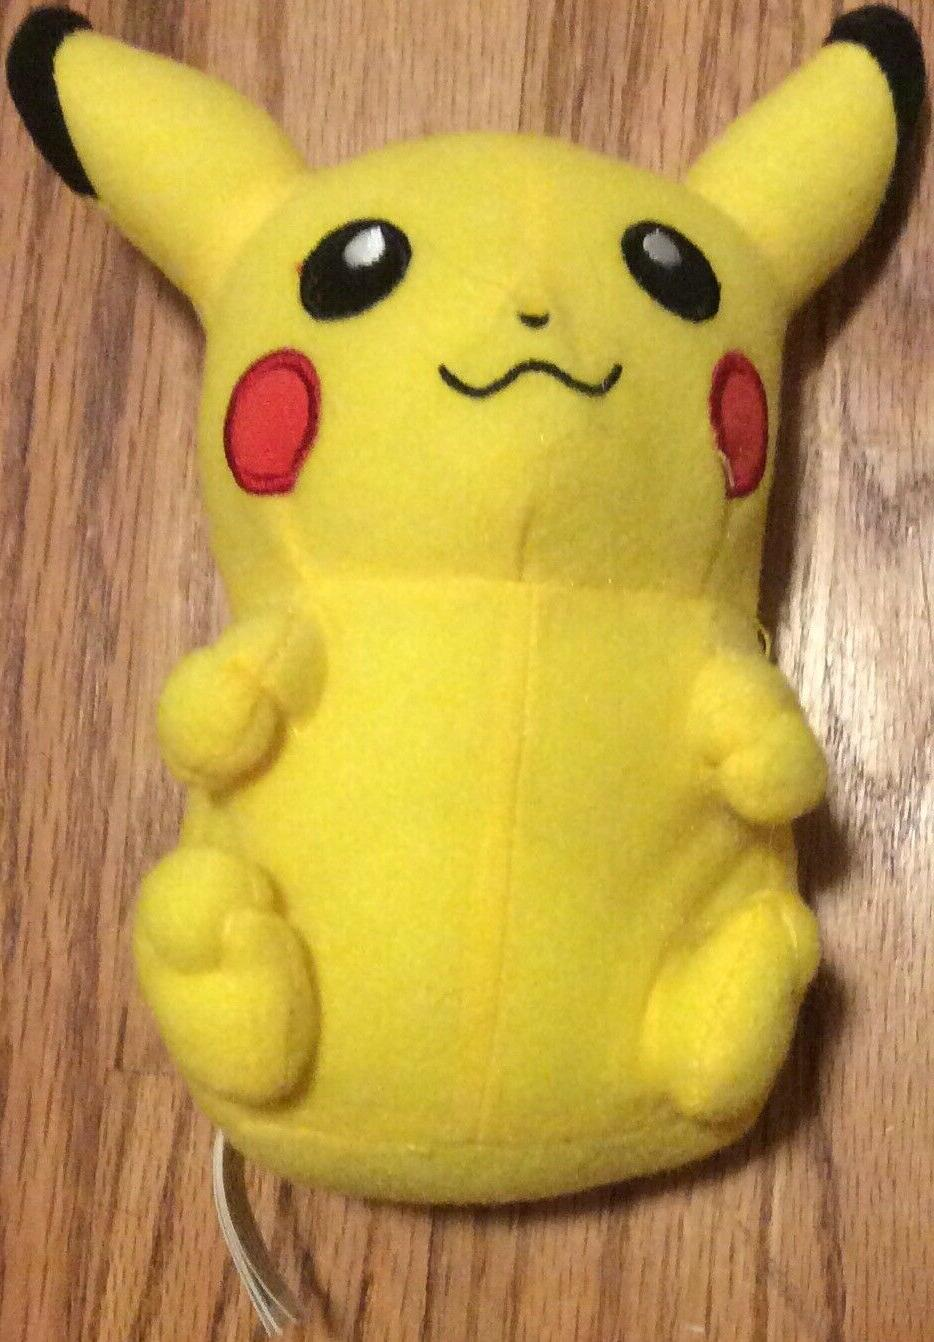 pokemon pikachu 7 plush toy toy factory